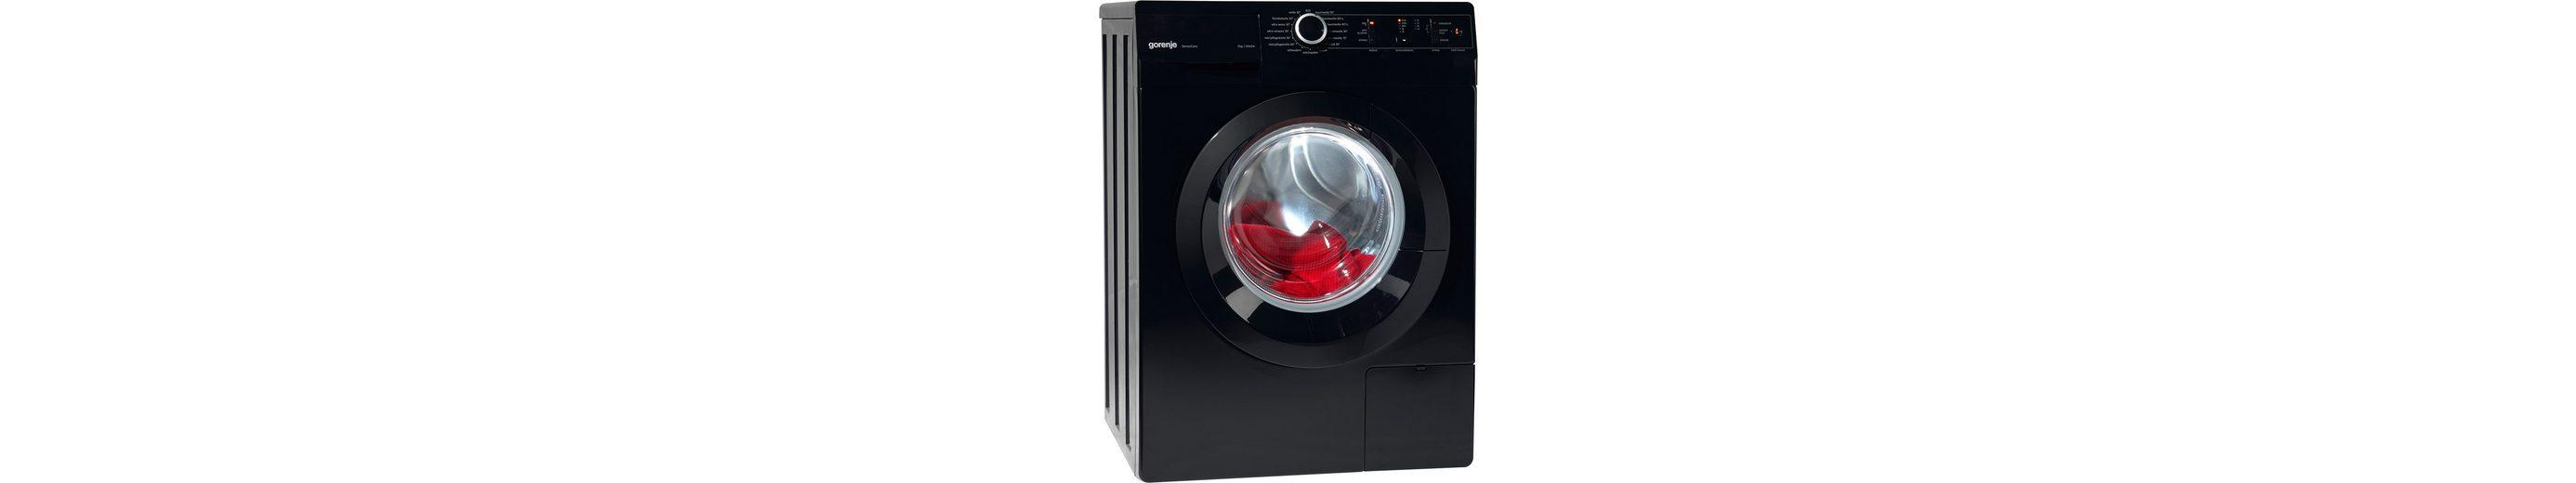 GORENJE Waschmaschine W7243PB A+++, A+++, 7 kg, 1400 U/Min